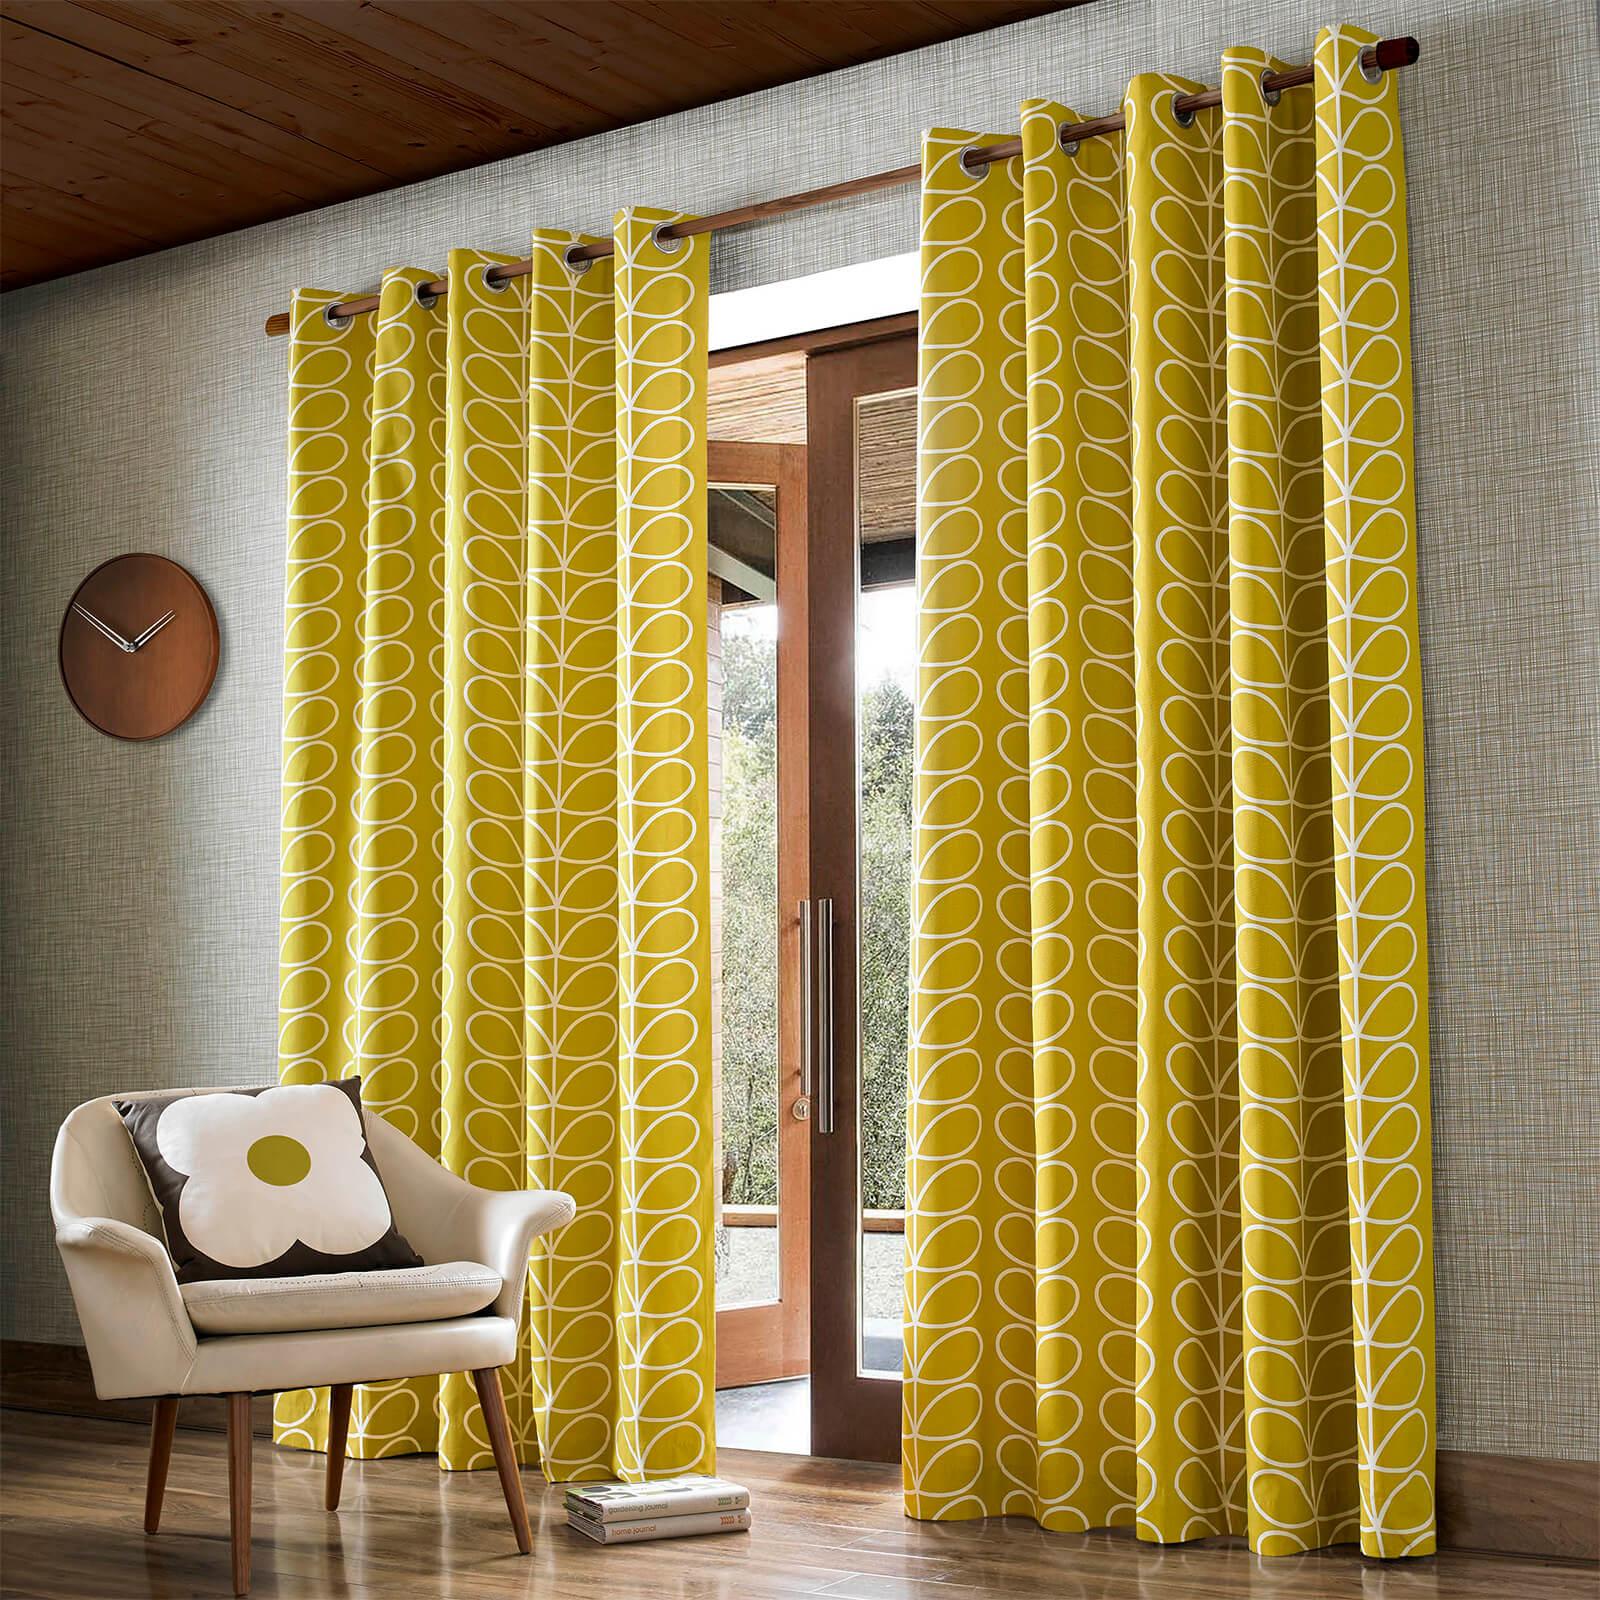 Orla Kiely Linear Stem Curtains - Dandelion - 66 x 72 Inches